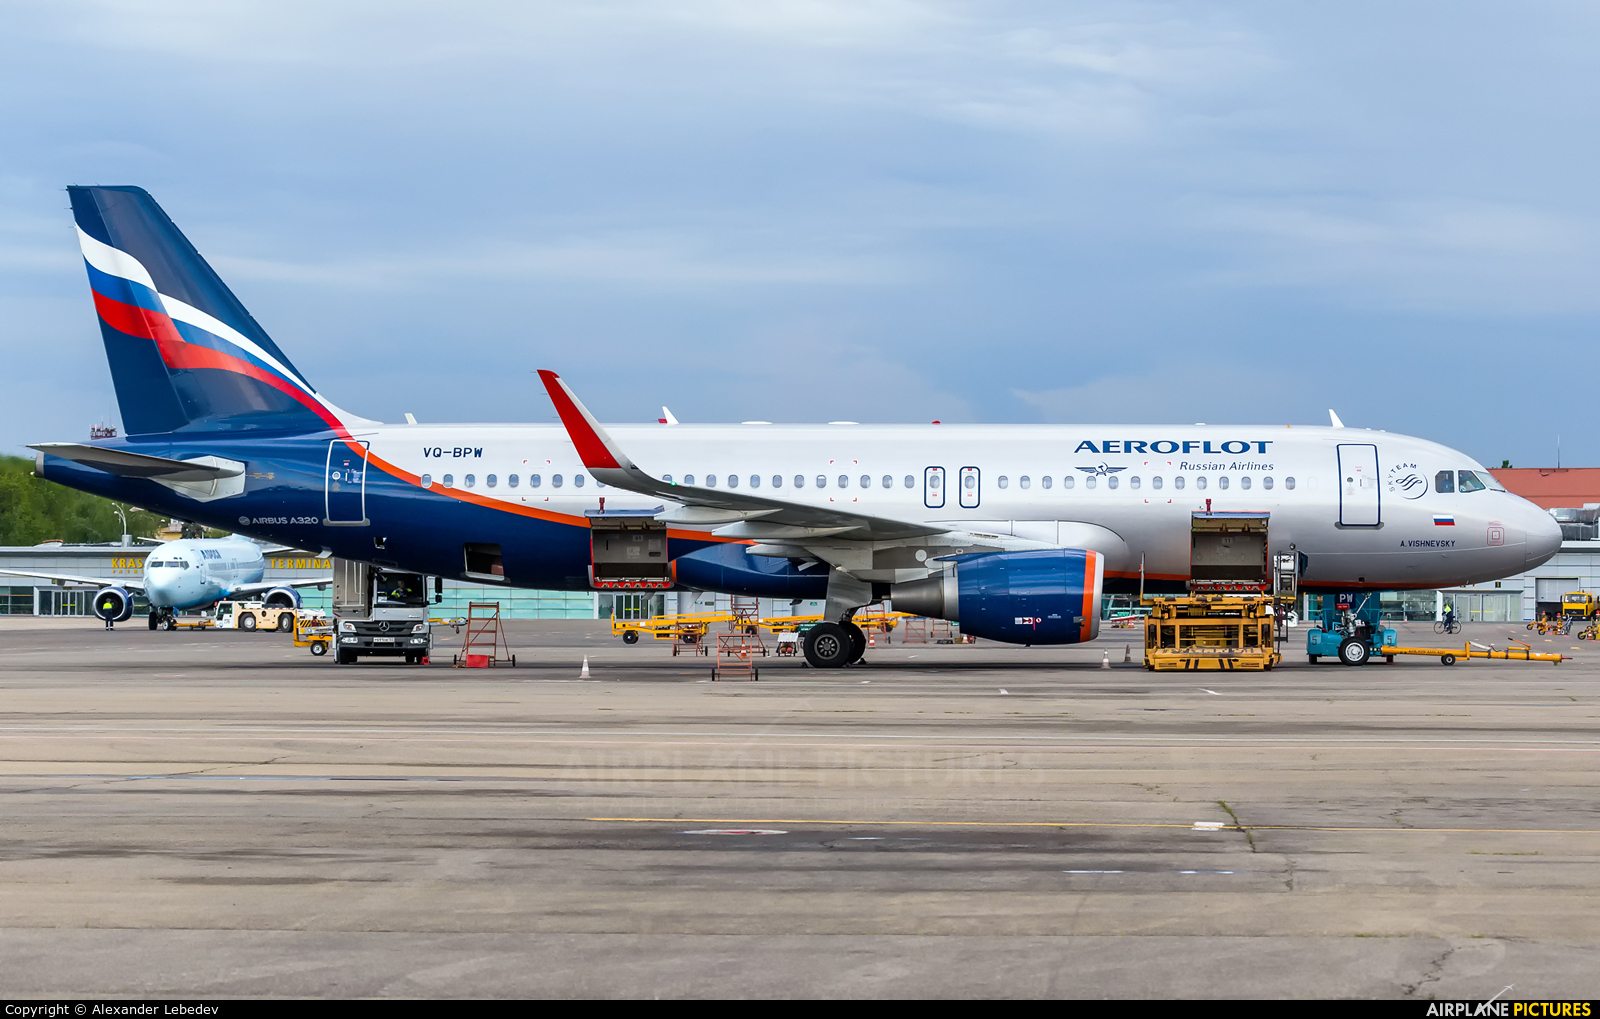 Aeroflot VQ-BPW aircraft at Krasnodar